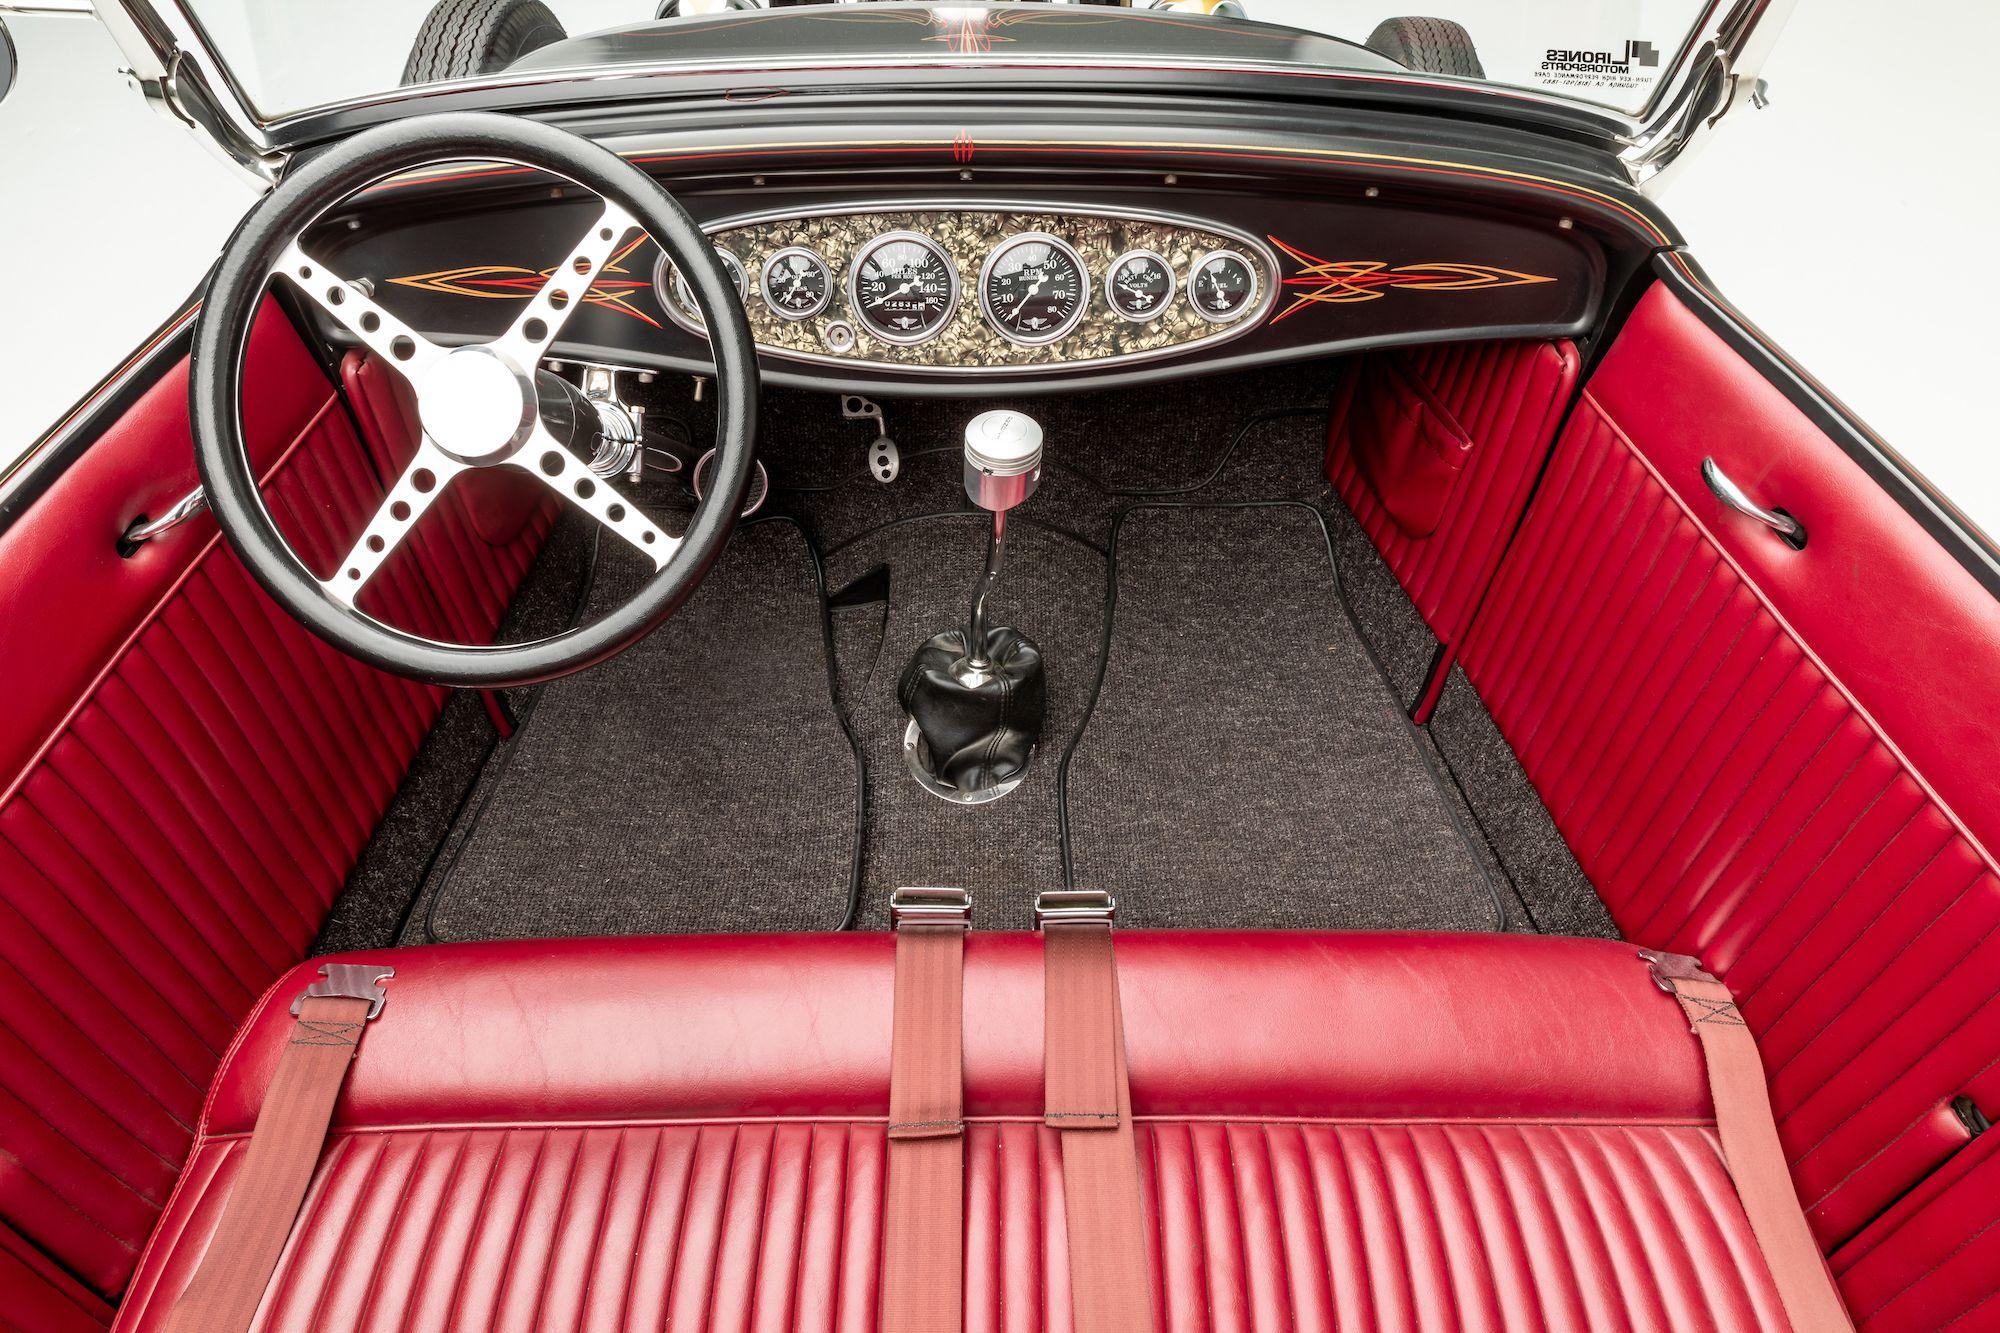 10 Iron Man - Petersen Automotive Museum